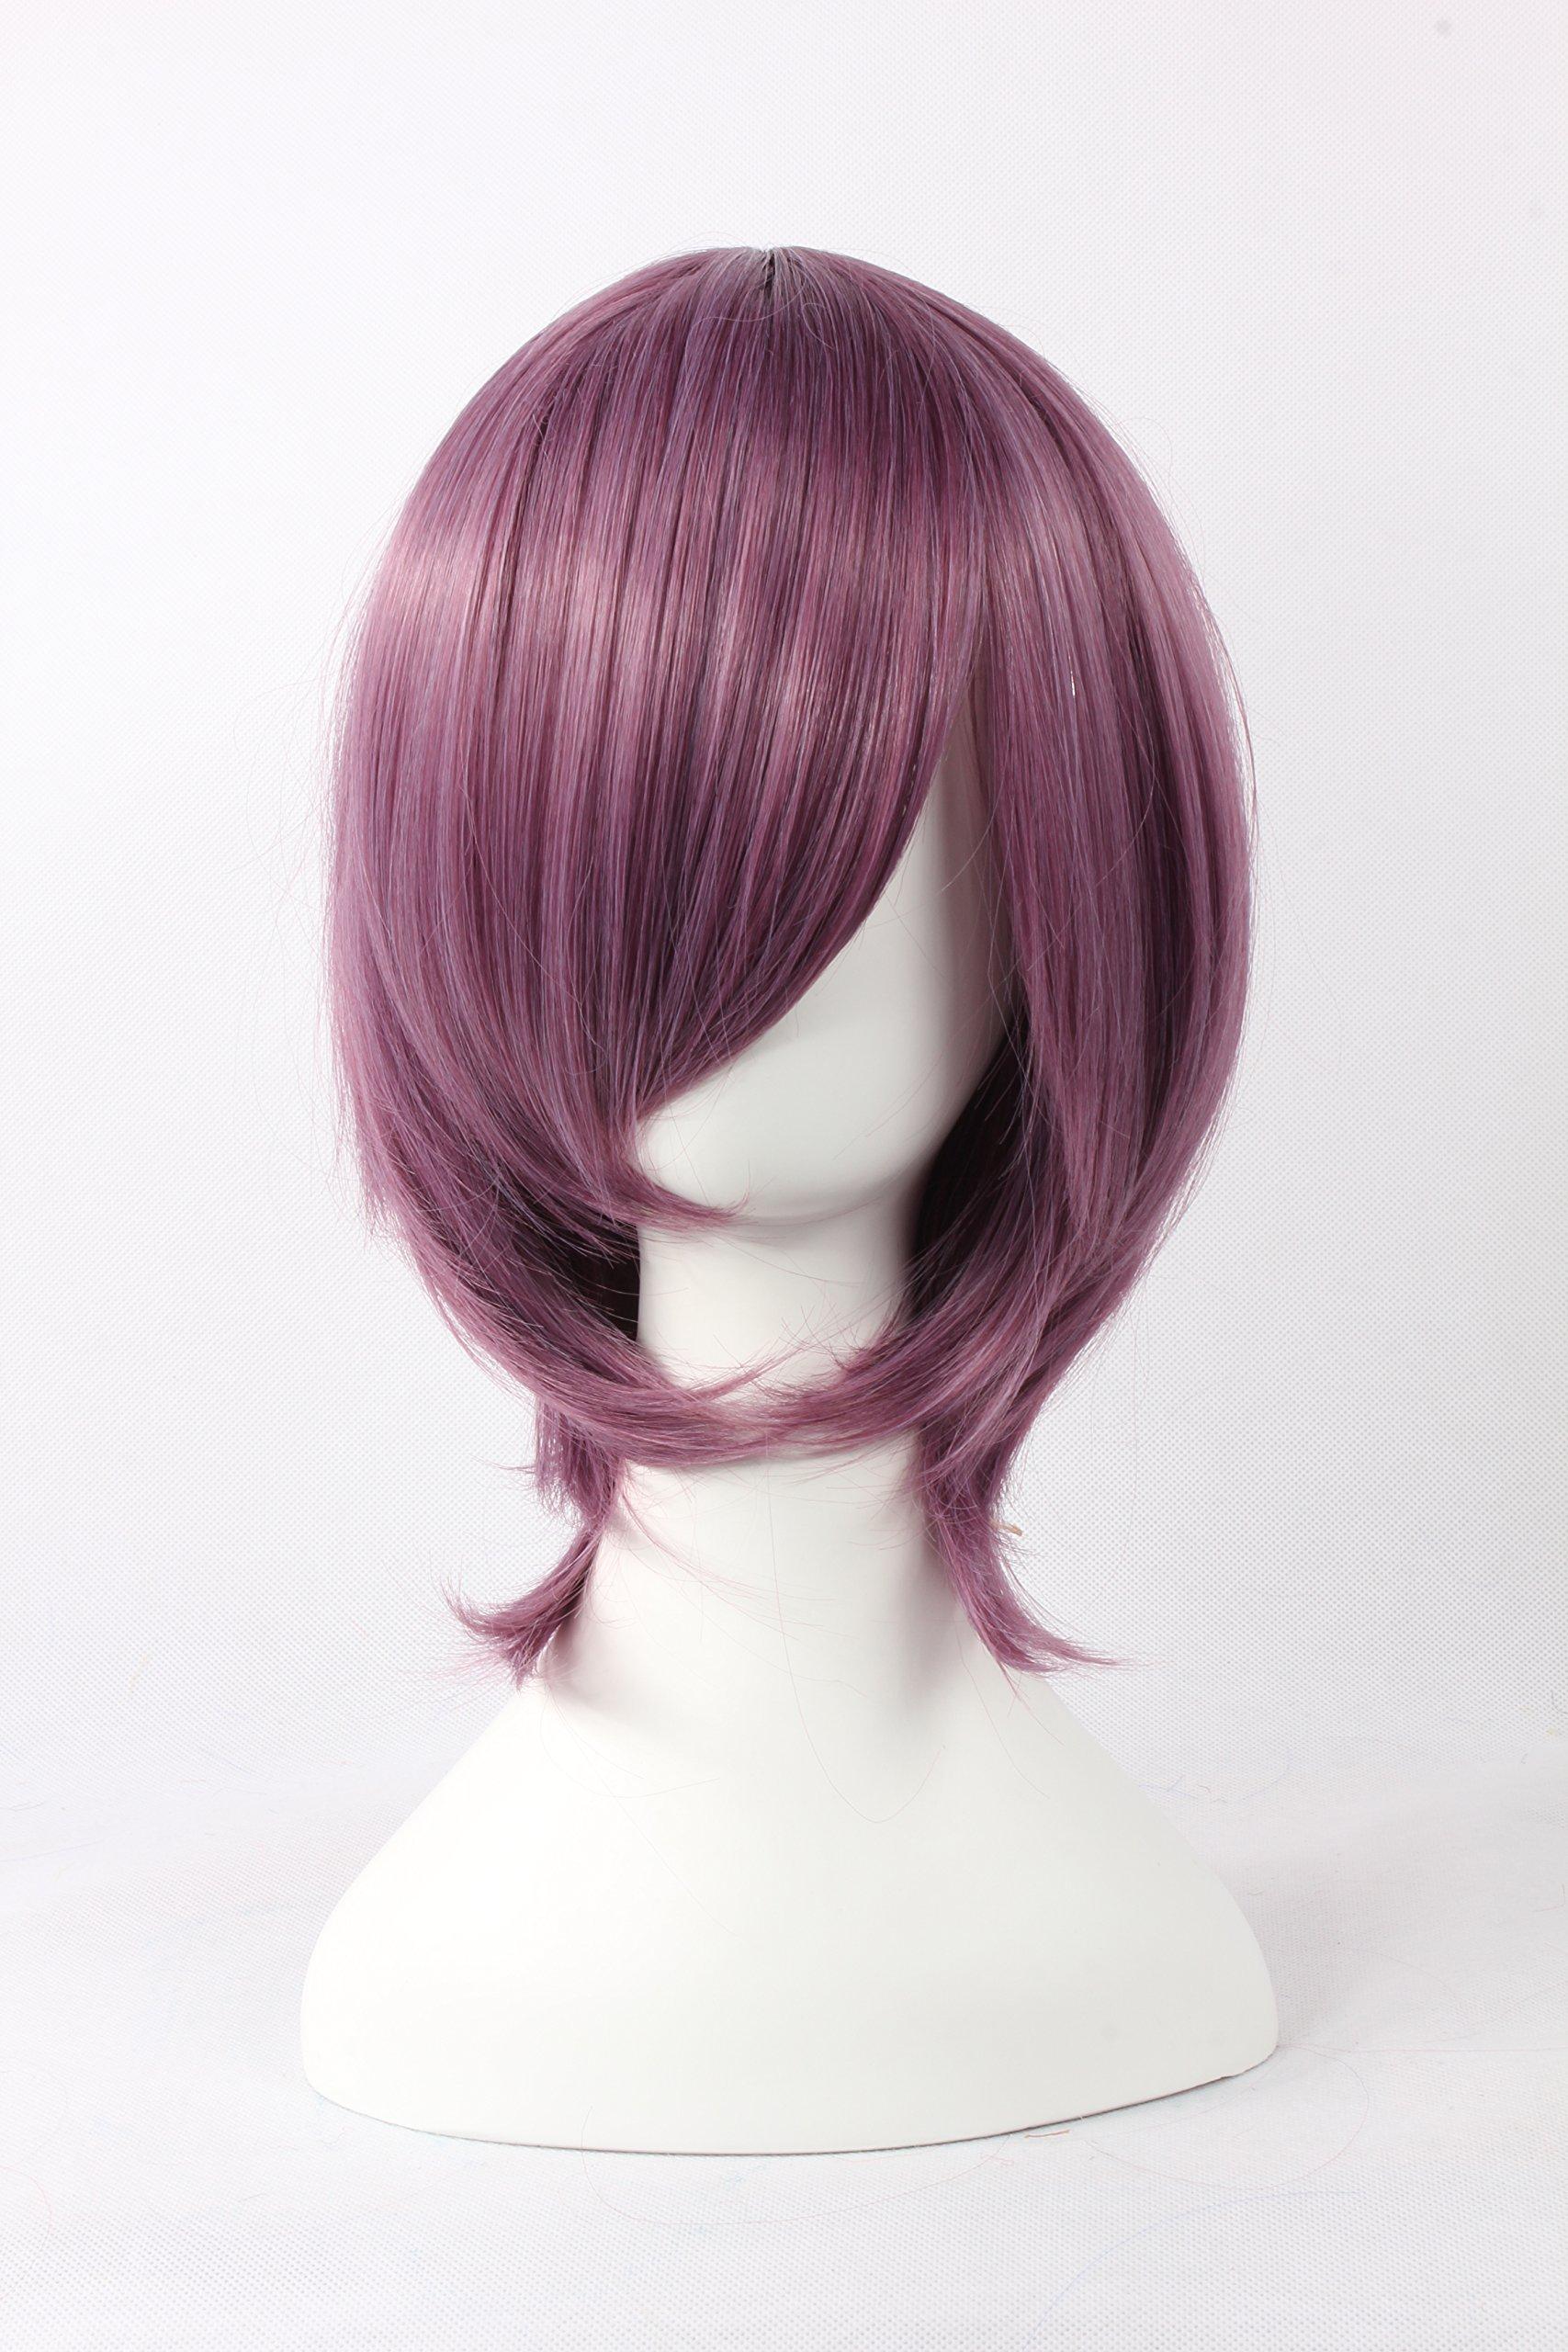 Coolsky Wigs Natsume Yuujinchou,Azrael,Saint Seiya Series Mix Purple Hair Cosplay Wig